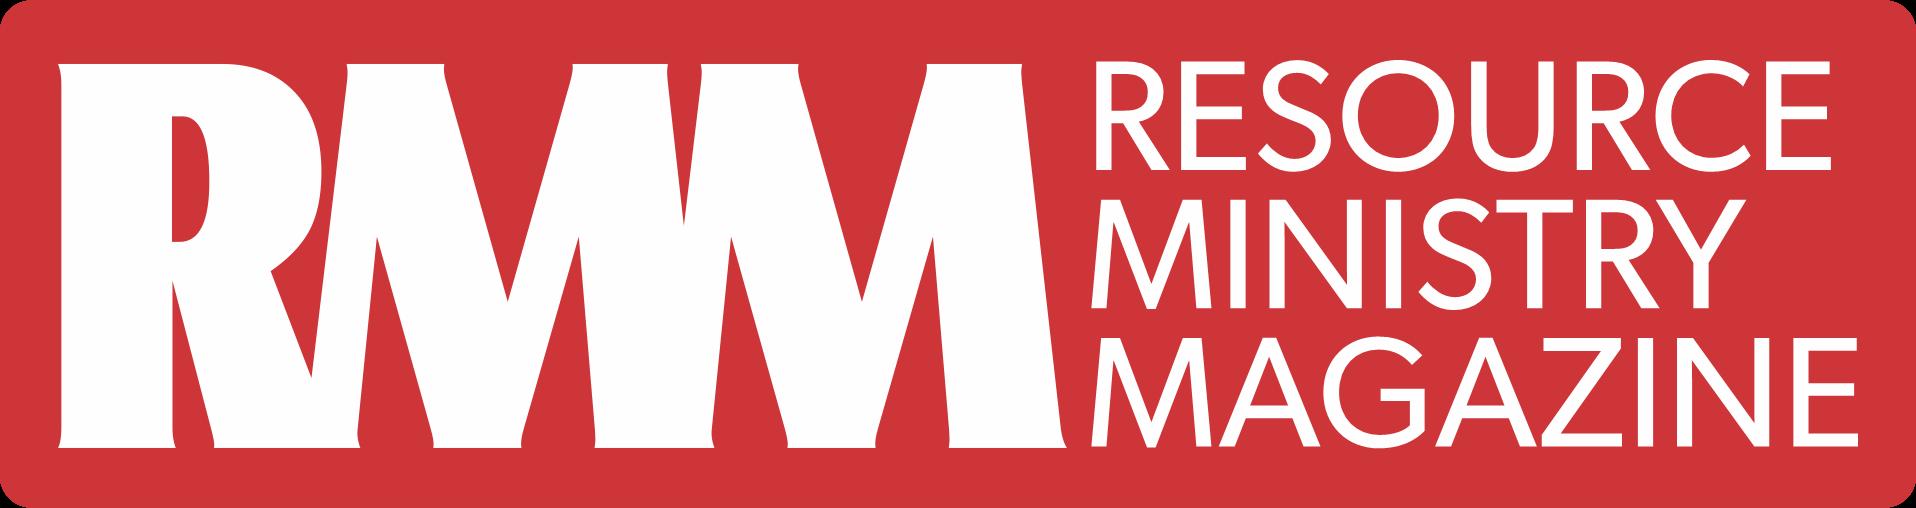 rmm-logo-4.png